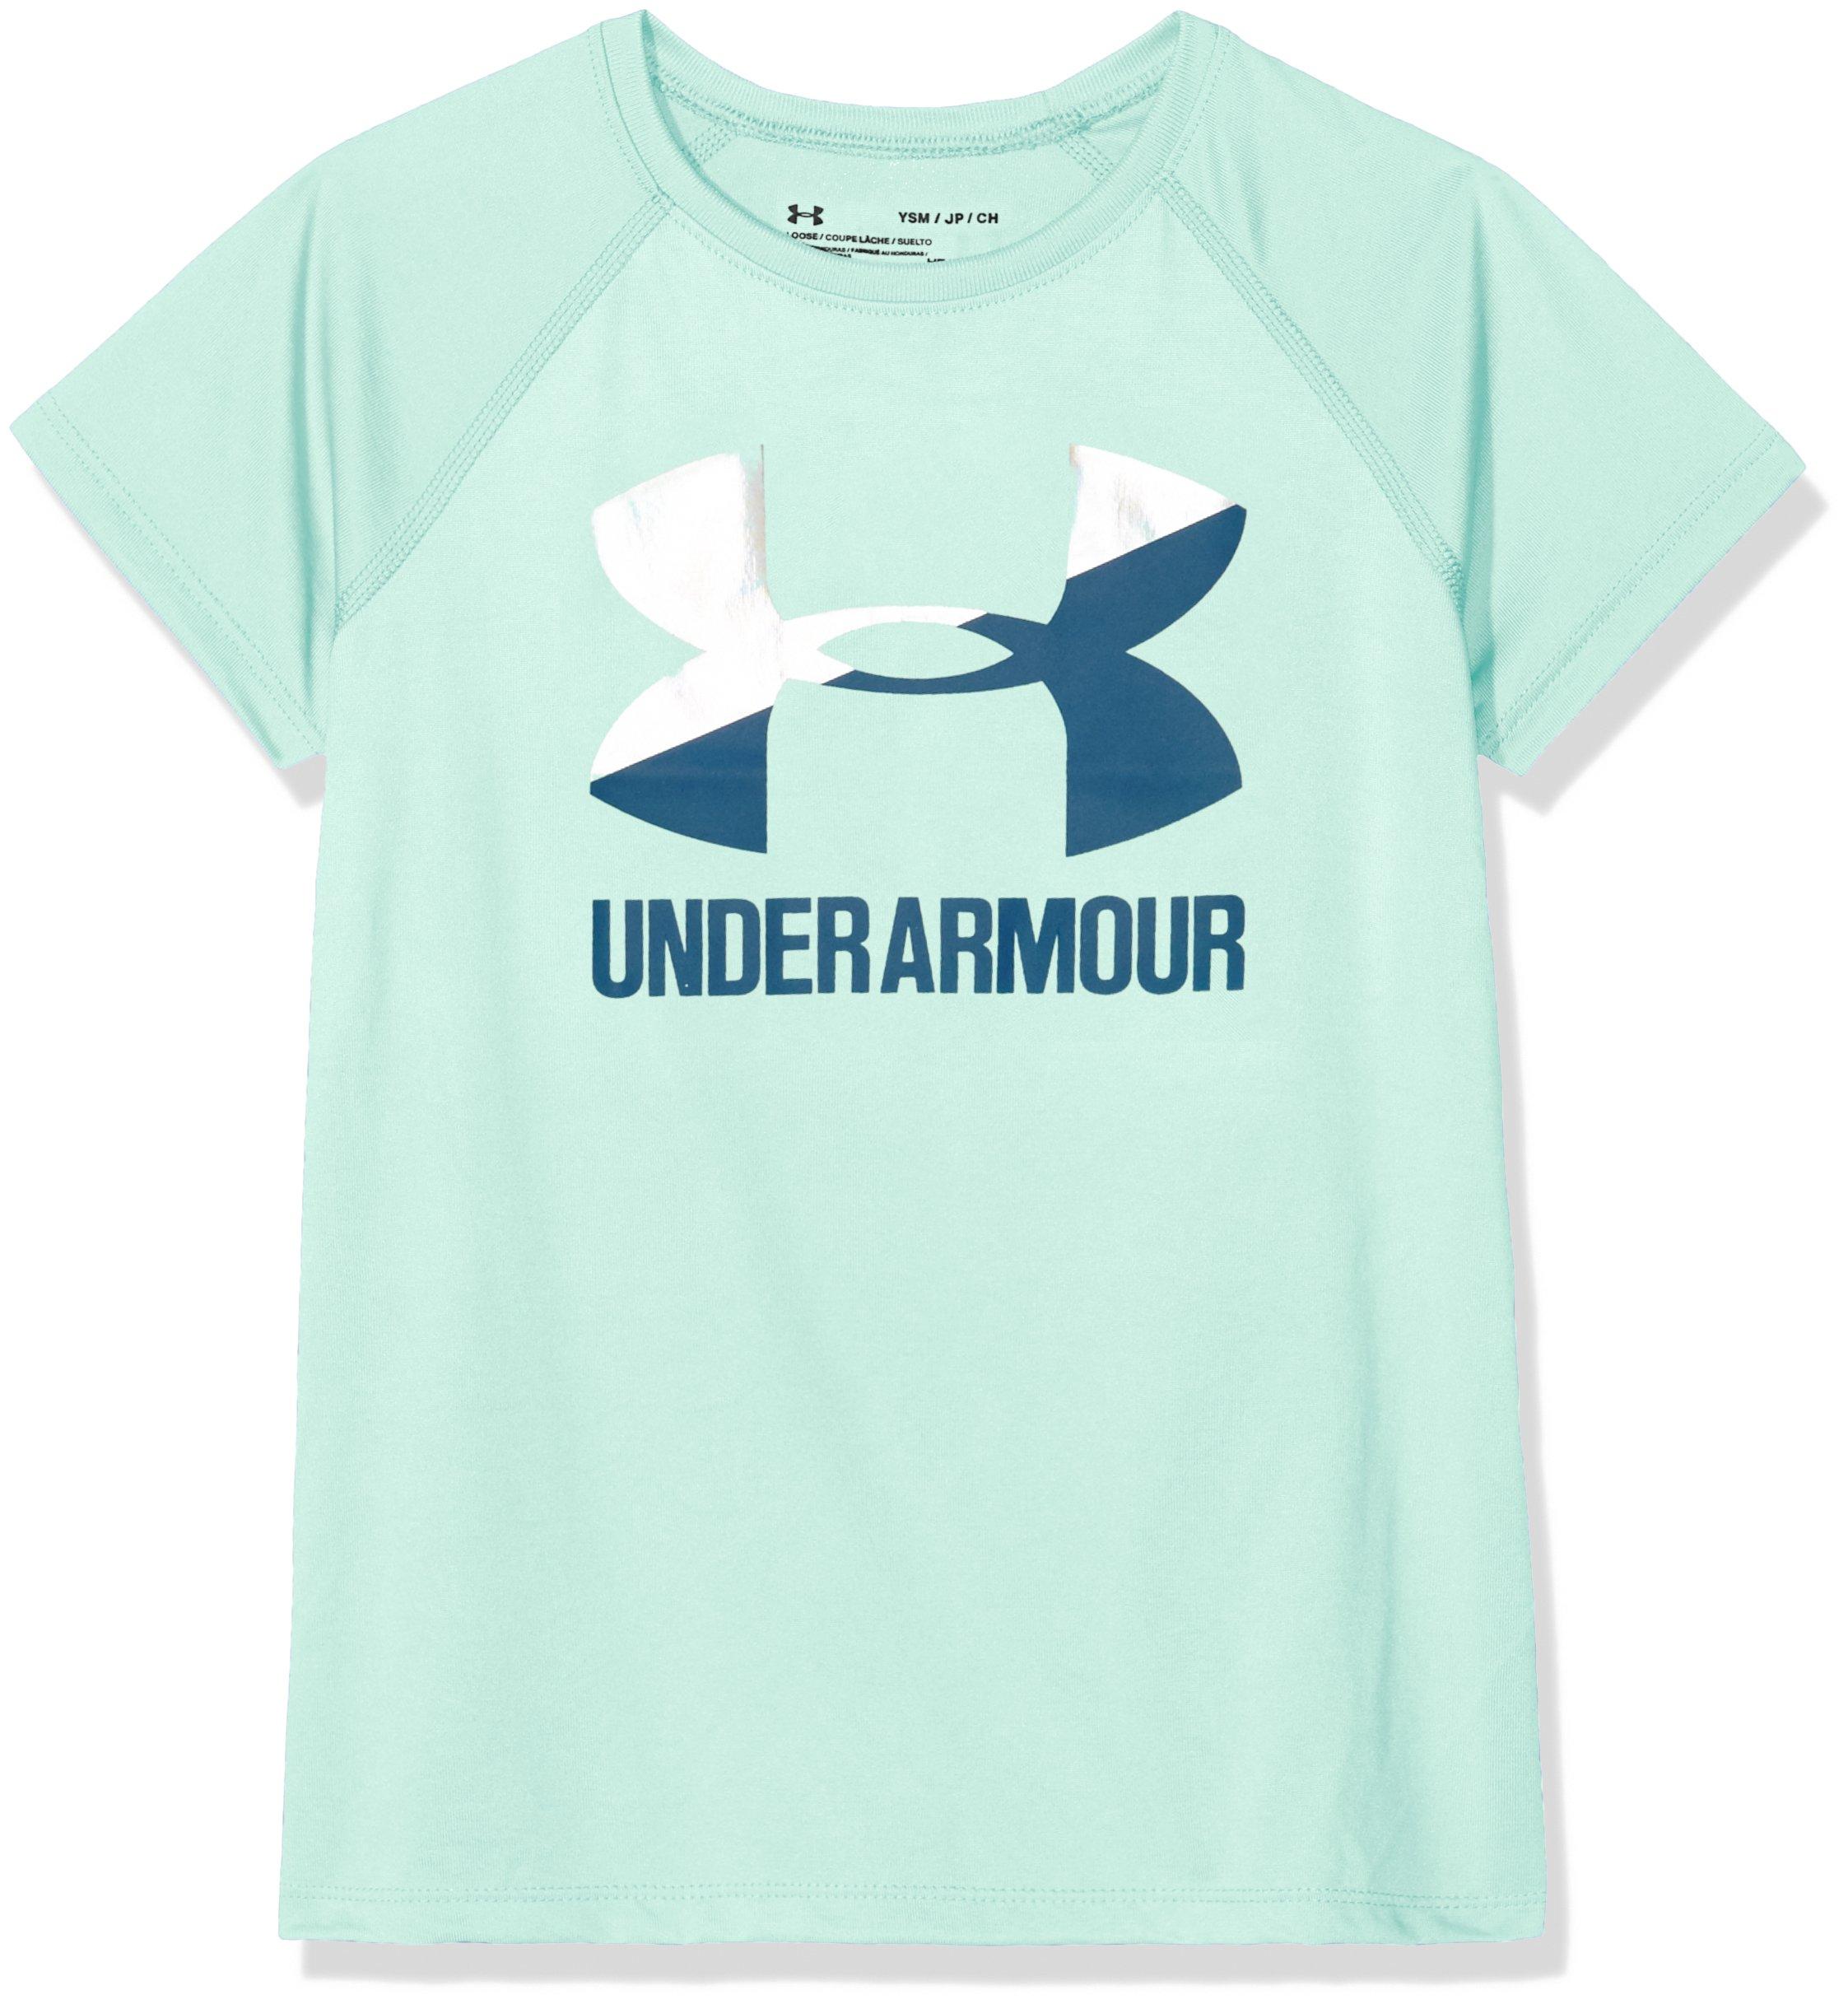 Under Armour Girls Solid Big Logo Short Sleeve T-Shirt, Refresh Mint/Moroccan Blue, Youth Medium